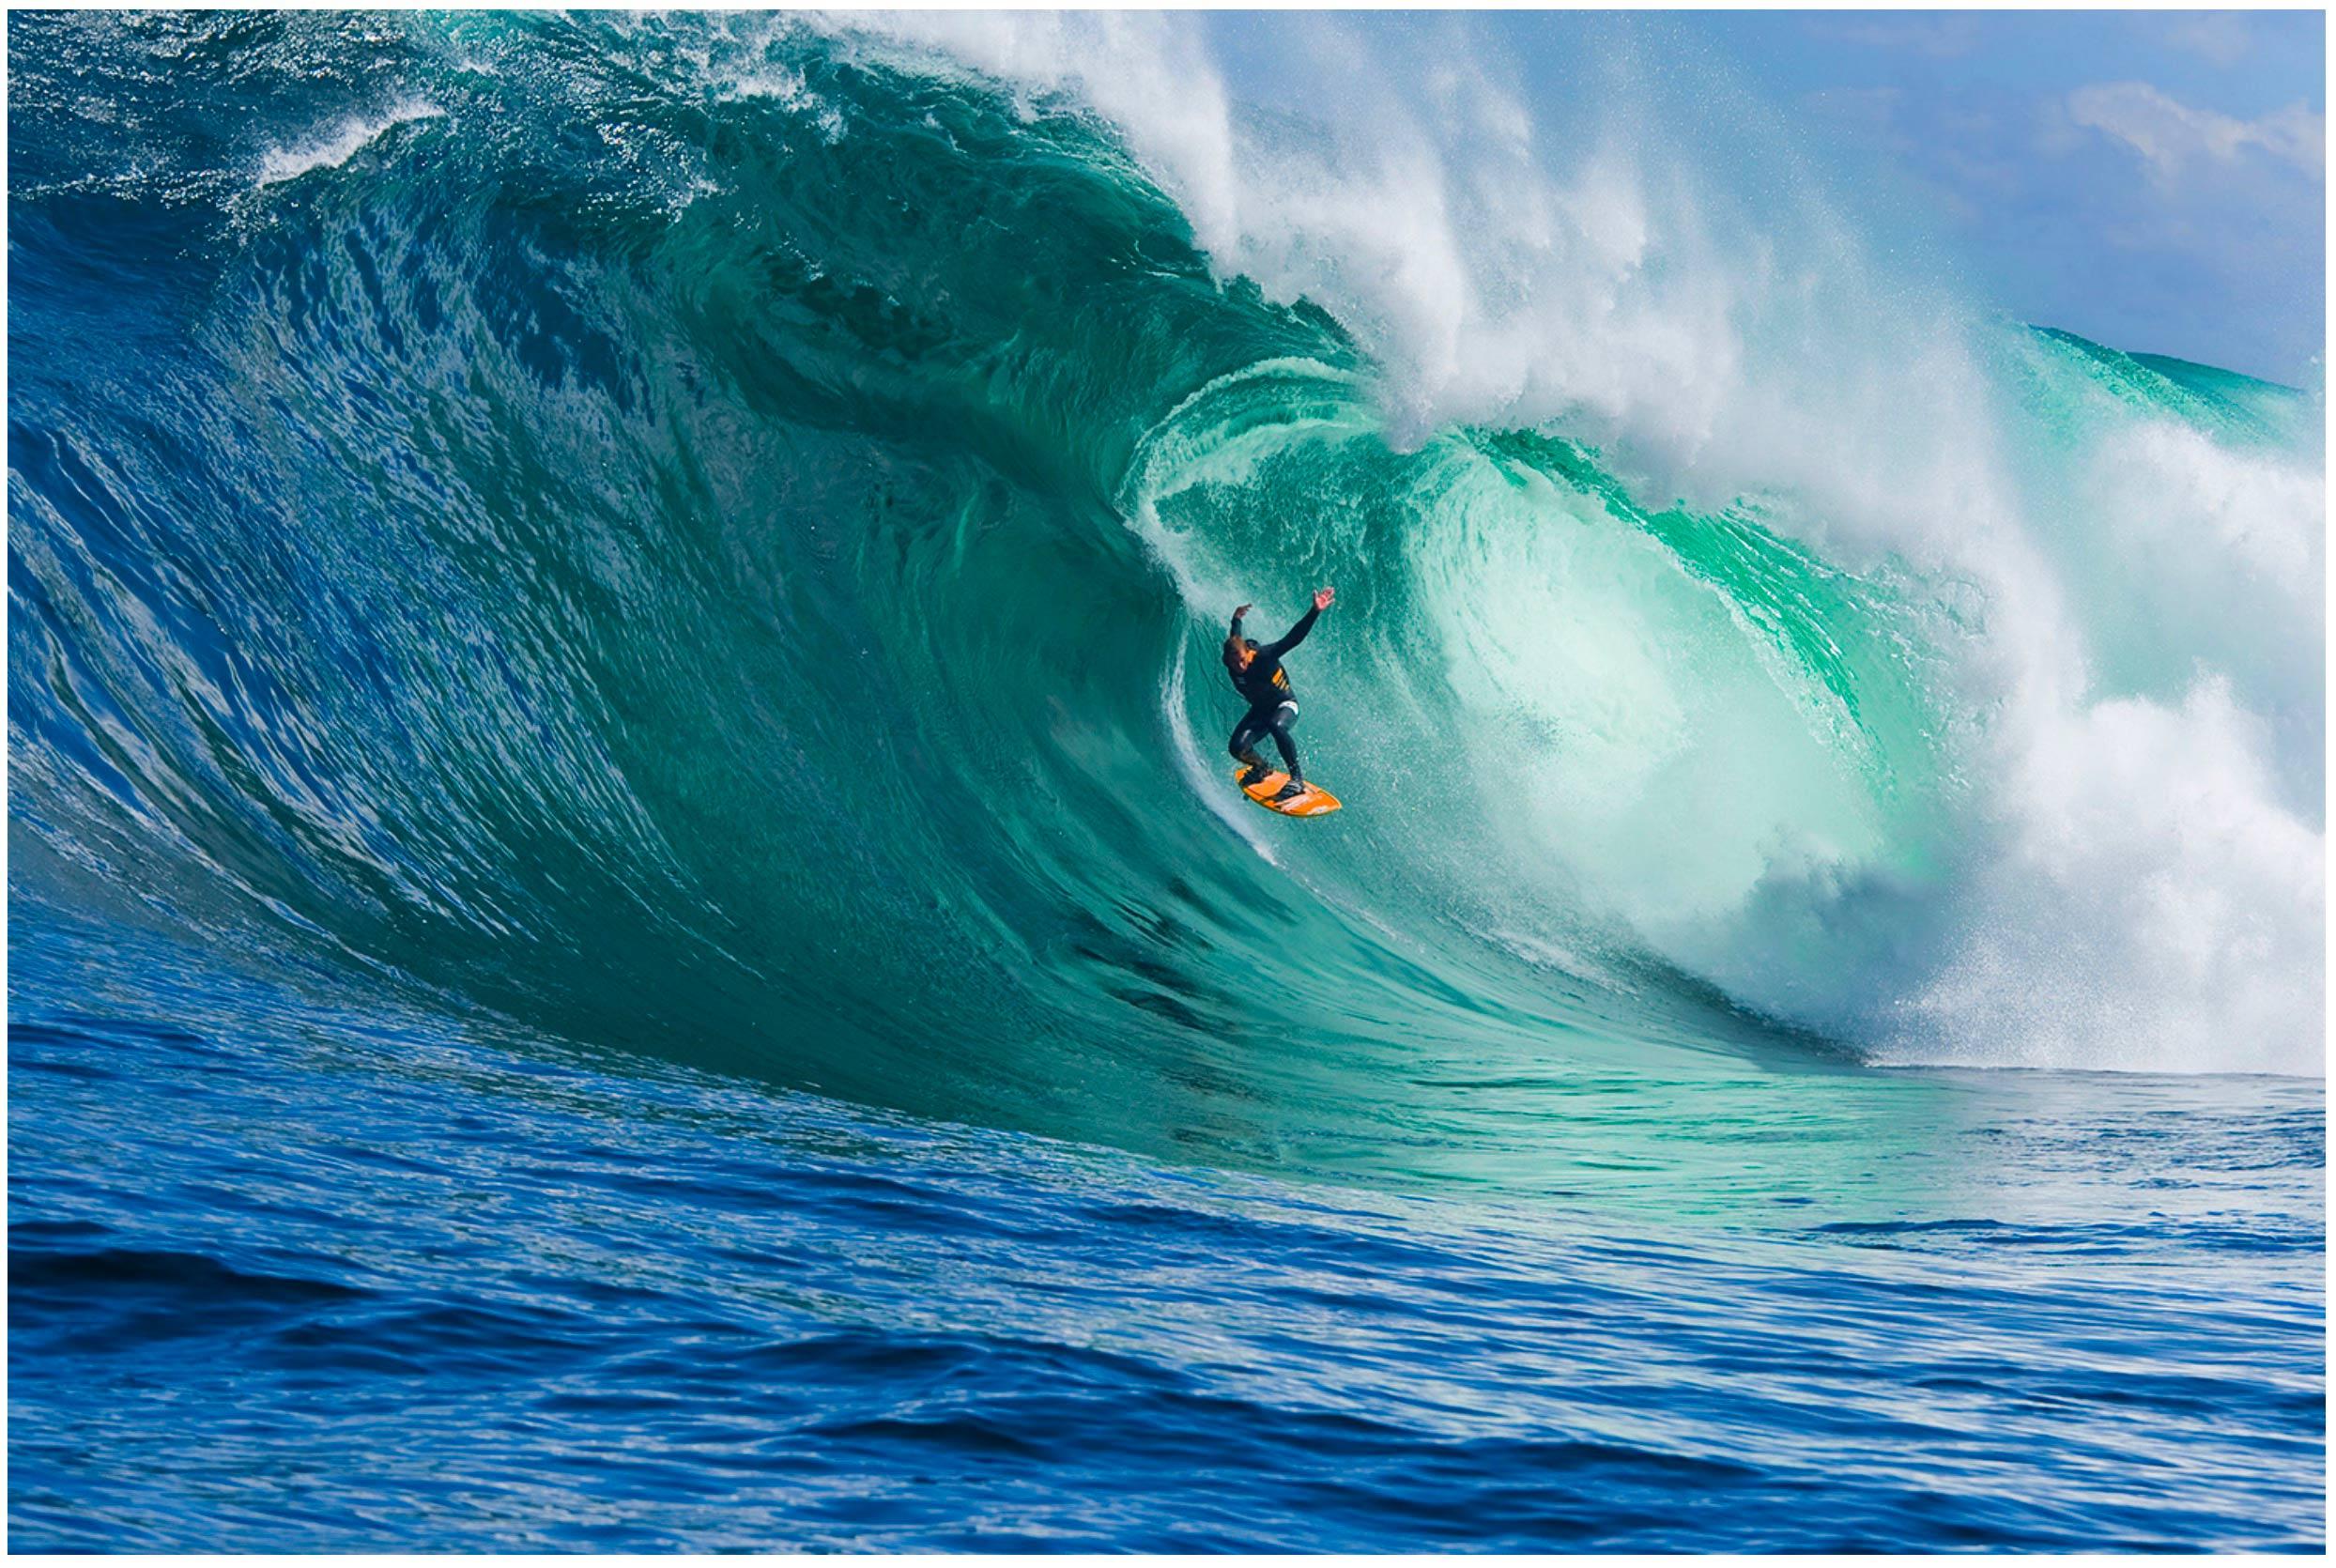 rodd-owen-surf-photography-for-sale-owenphoto-272.jpg